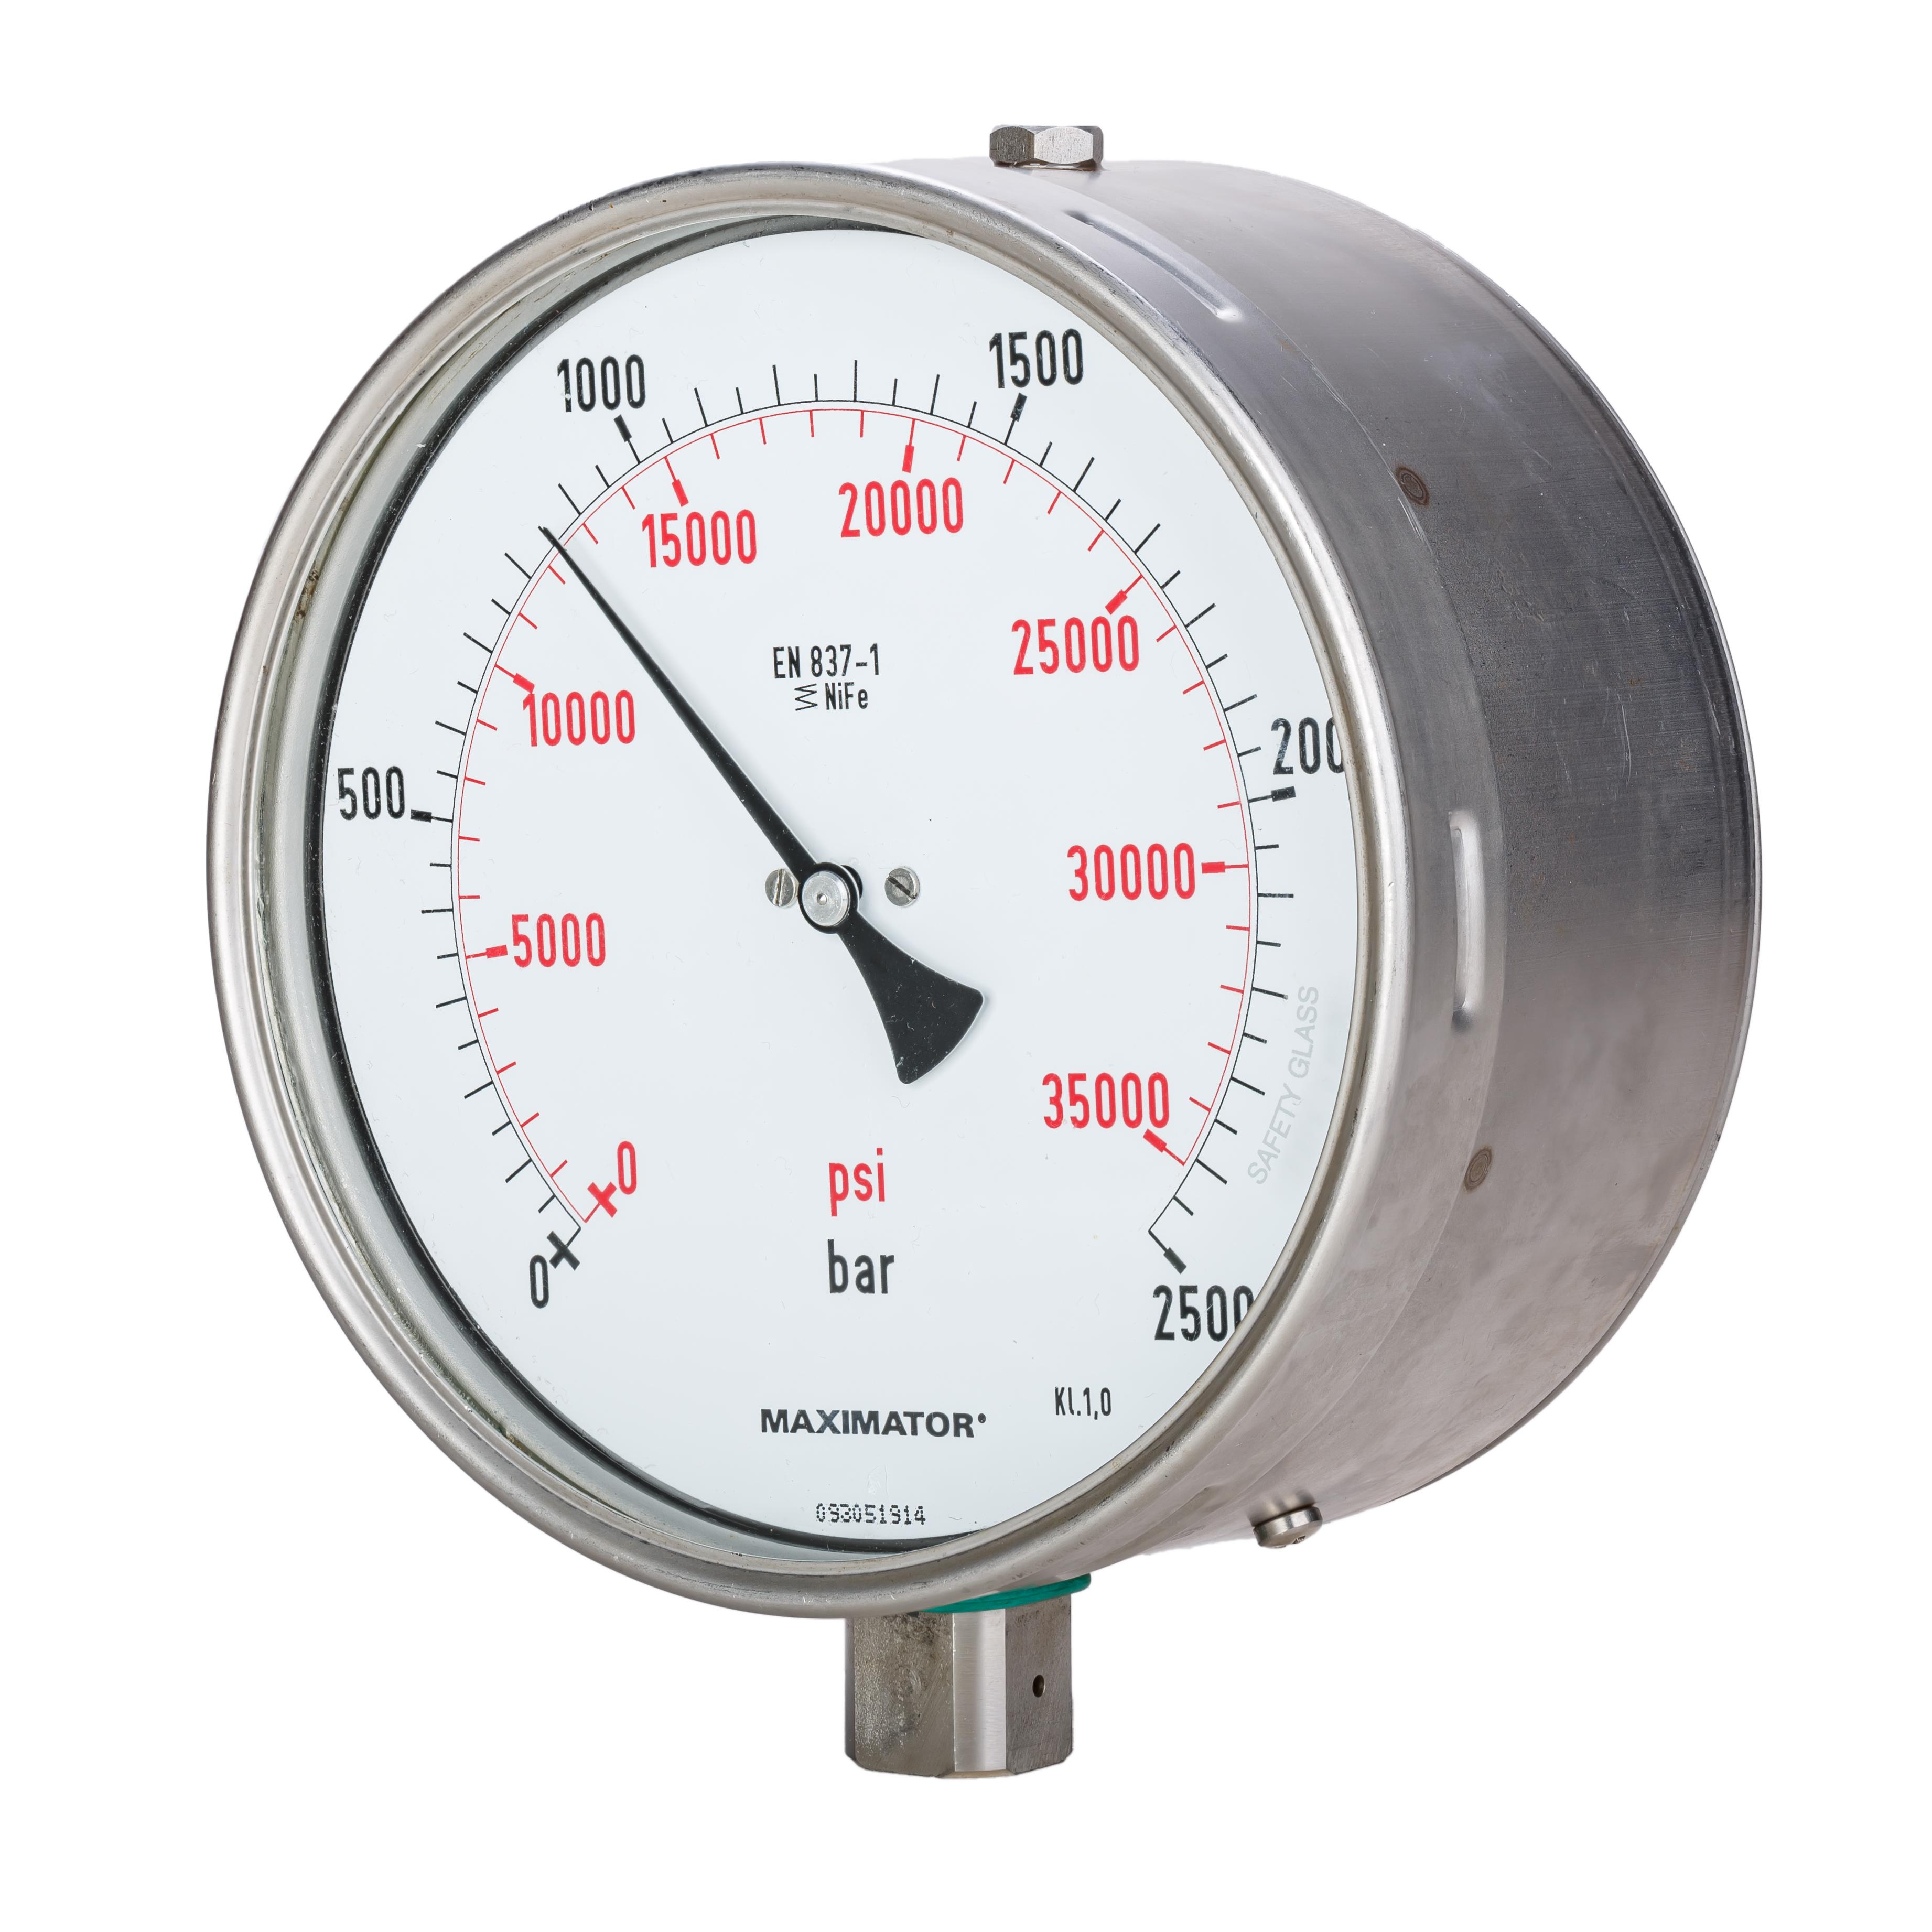 Where Can I Get High Pressure Air : Pressure measurement wikiwand